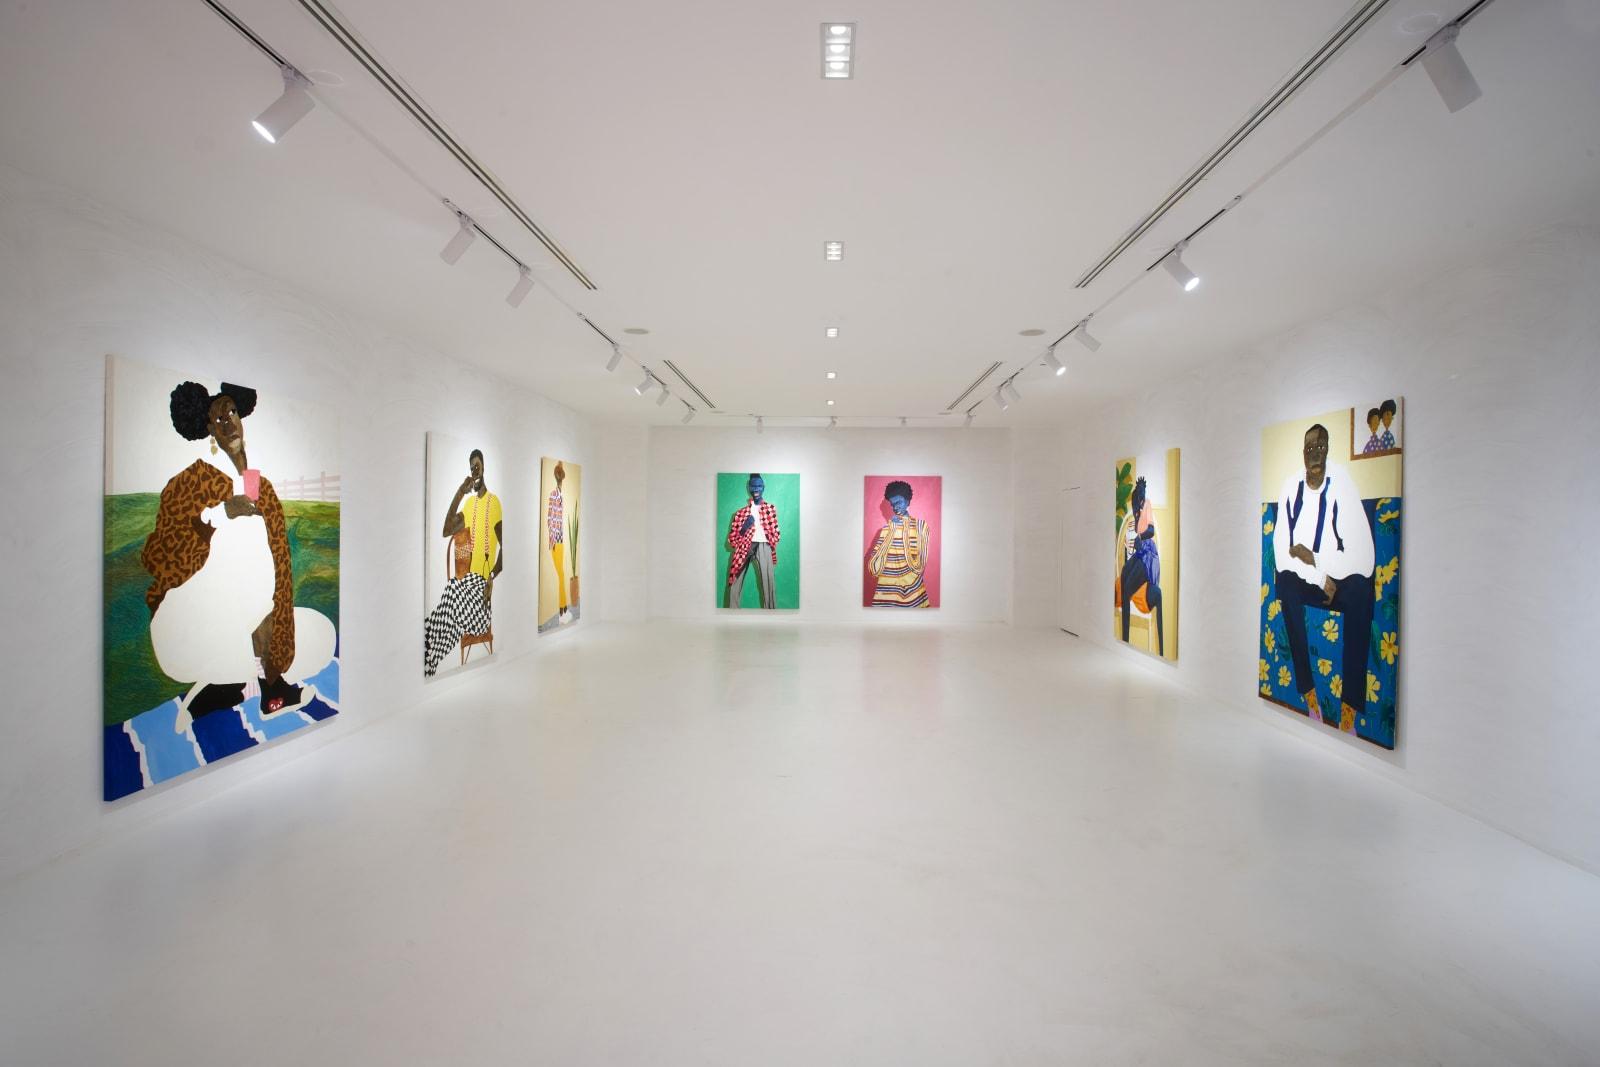 Adjei Tawiah & Aplerh-Doku Borlabi, Installation Shot, 2021